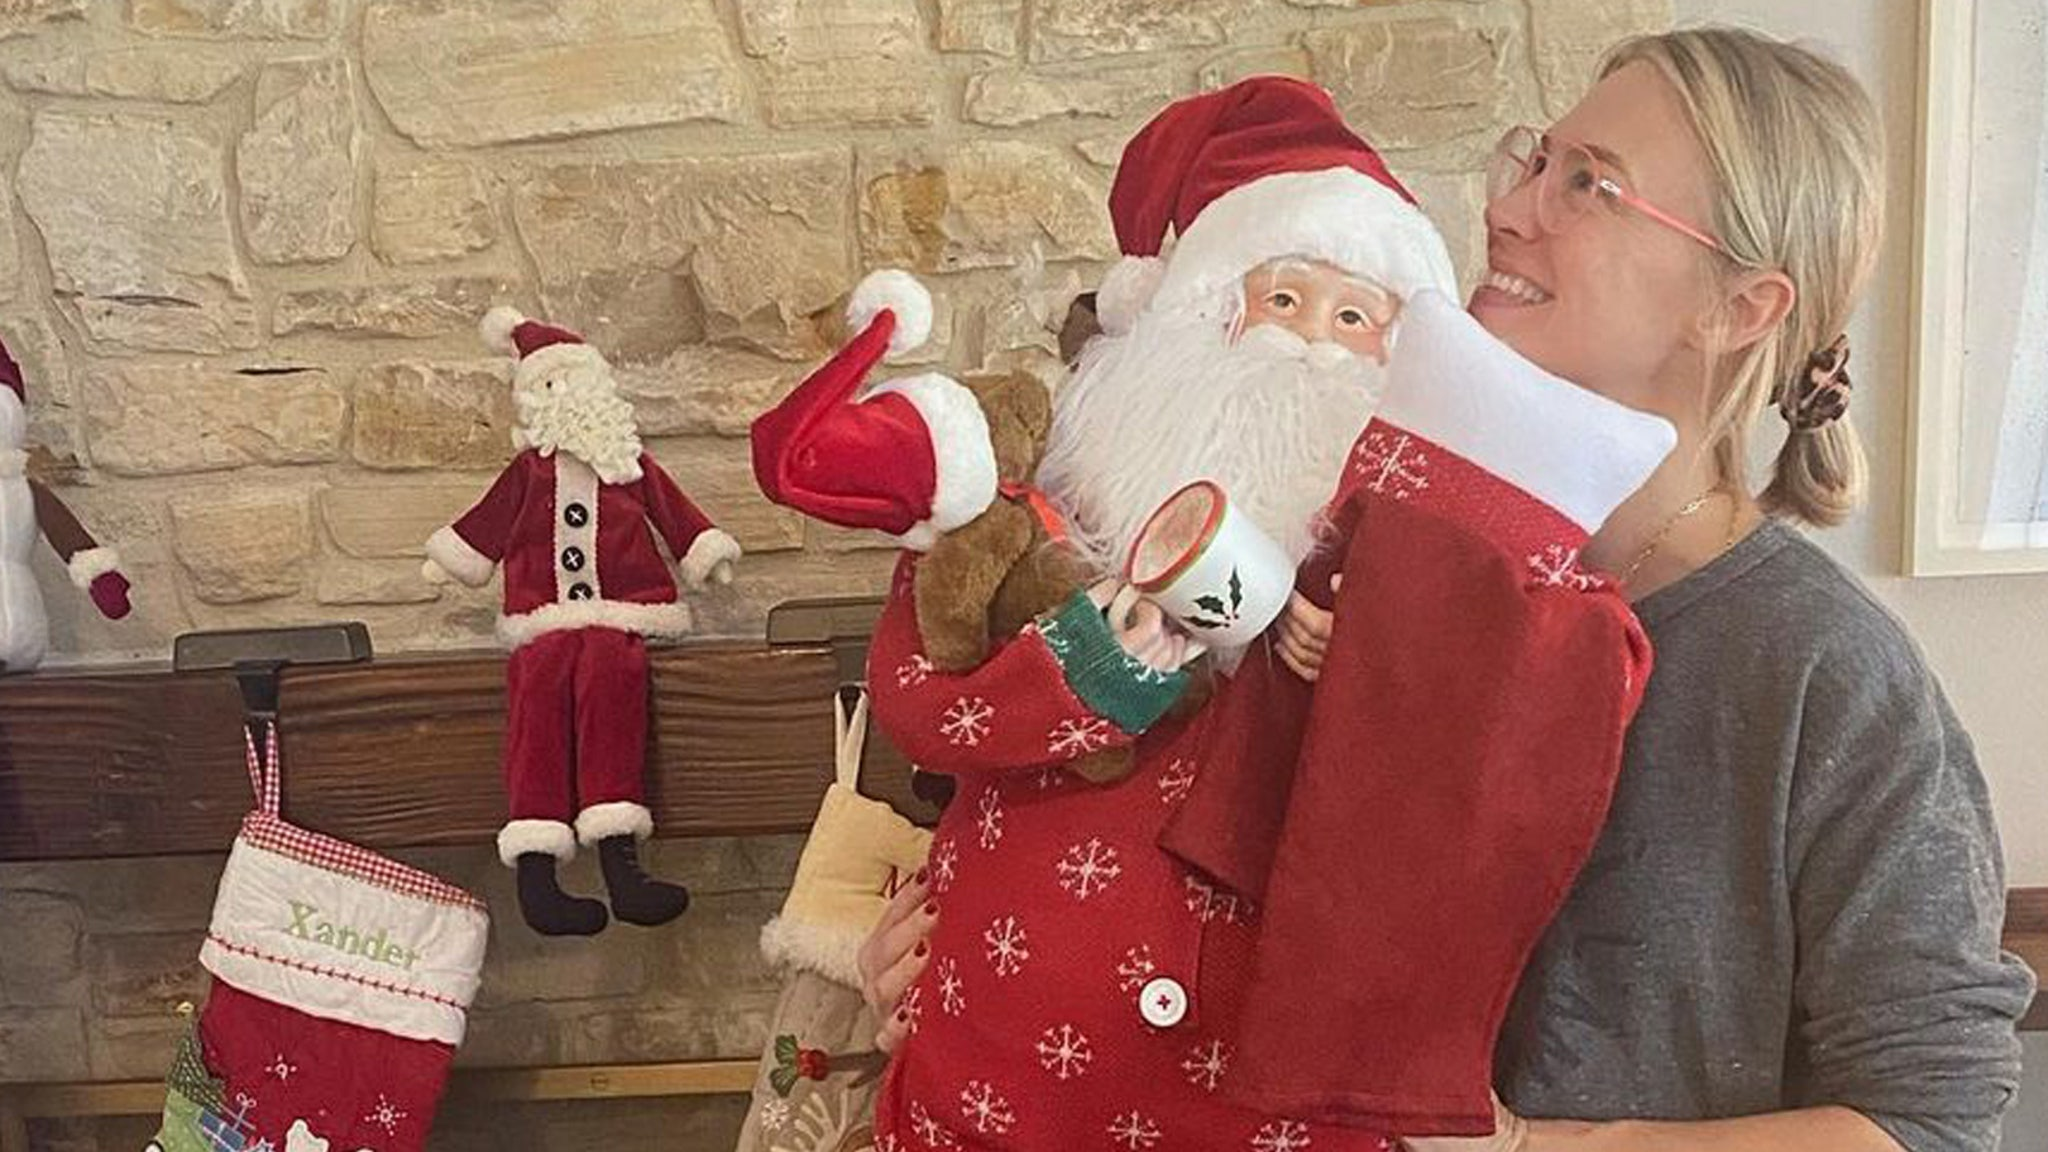 Celebs Who Are Already Celebrating Christmas in November